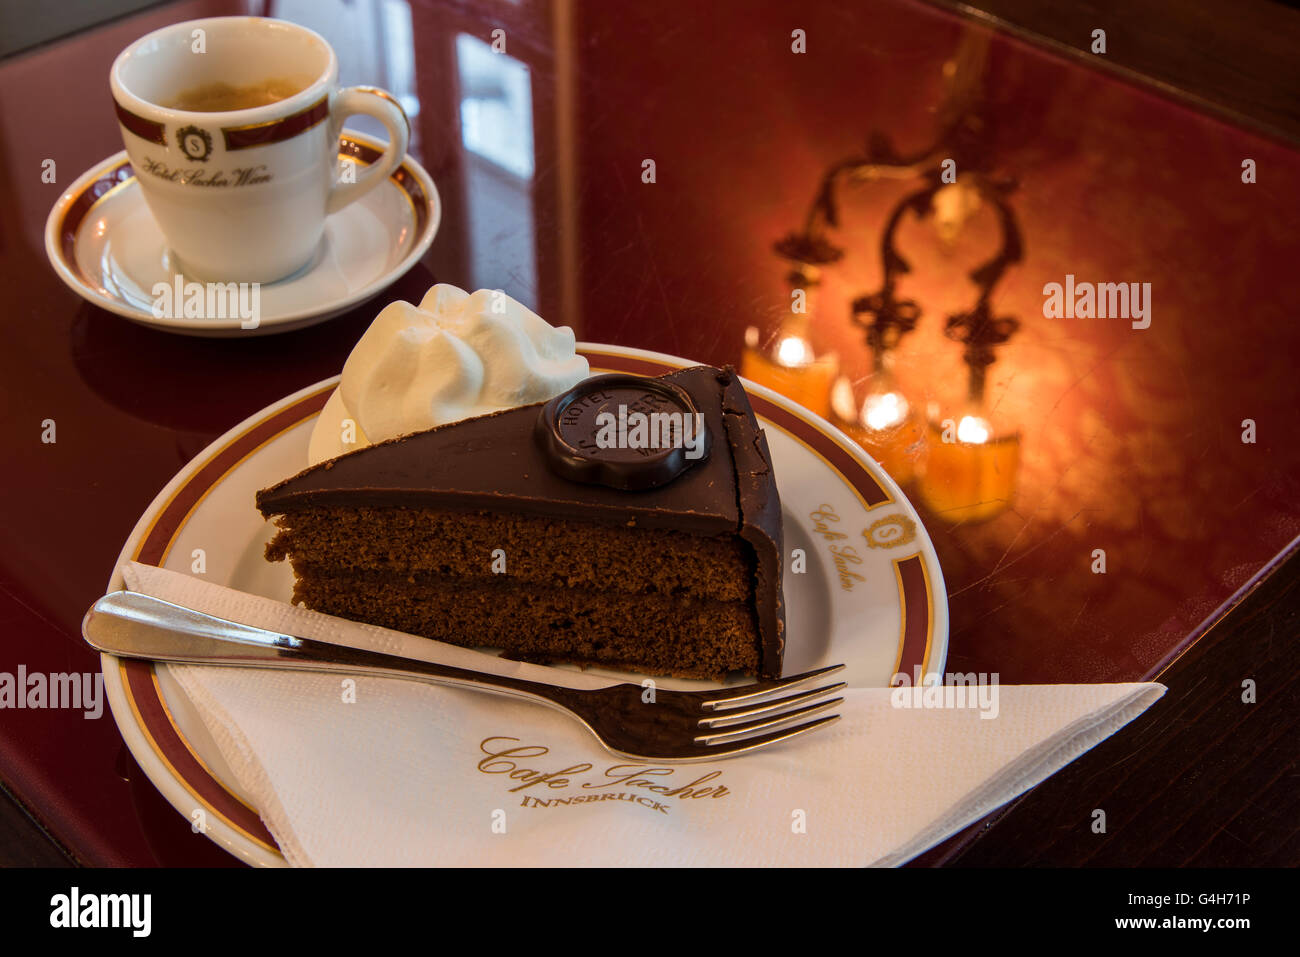 The original Sachertorte chocolate cake served at Cafe Sacher,  Innsbruck, Tyrol, Austria - Stock Image